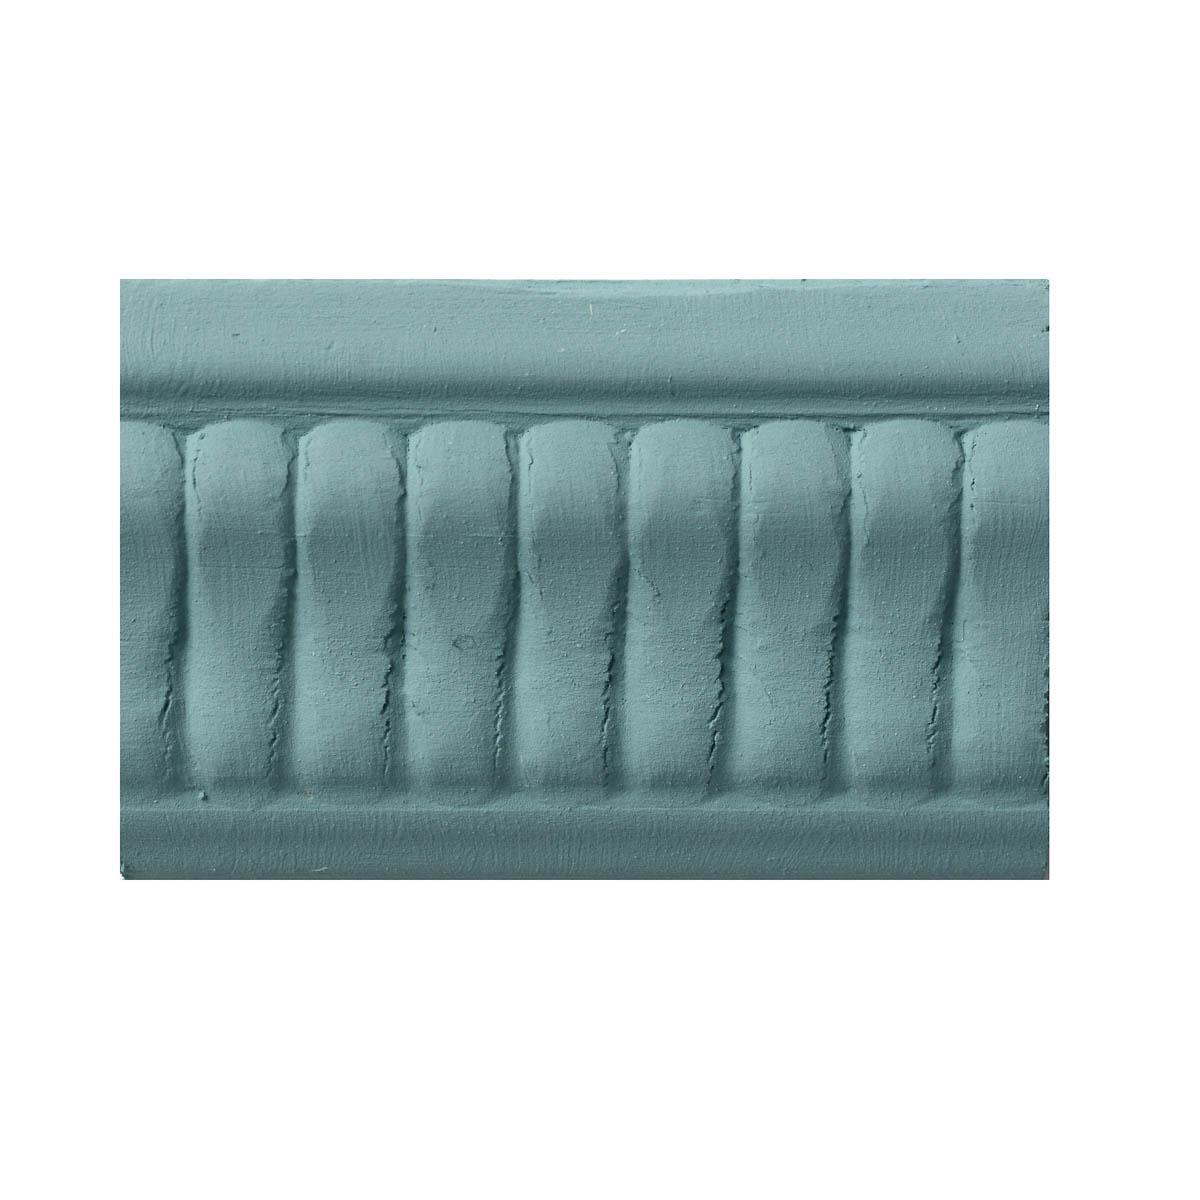 Waverly ® Inspirations Chalk Acrylic Paint - Agave, 8 oz.